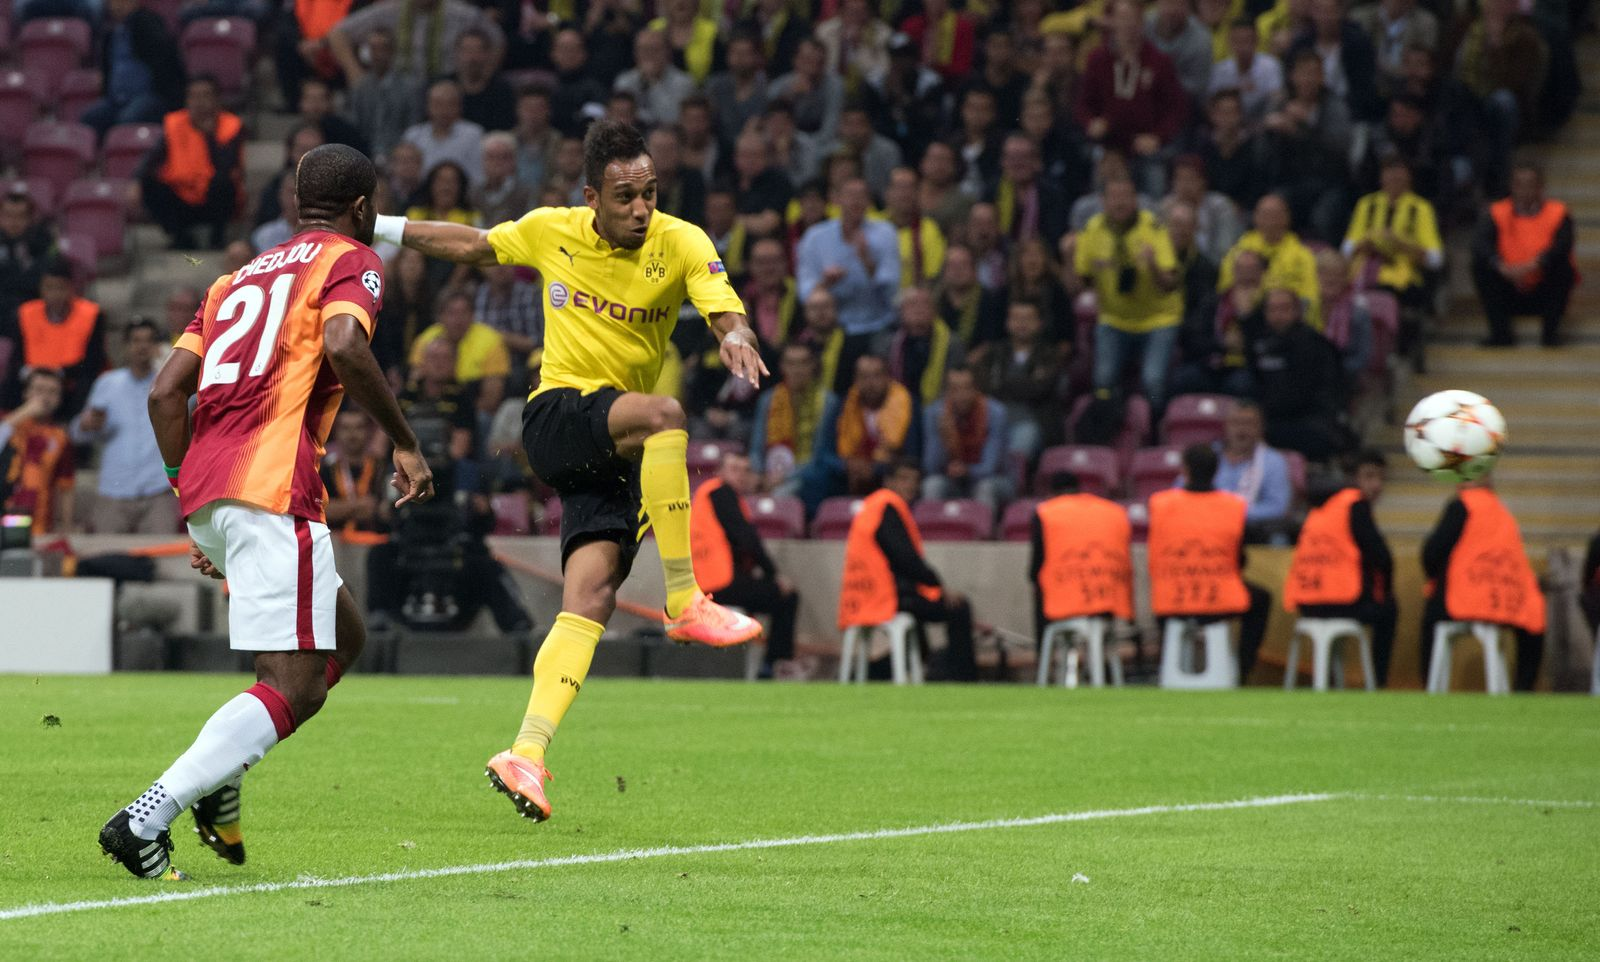 Galatasaray Istanbul - Borussia Dortmund